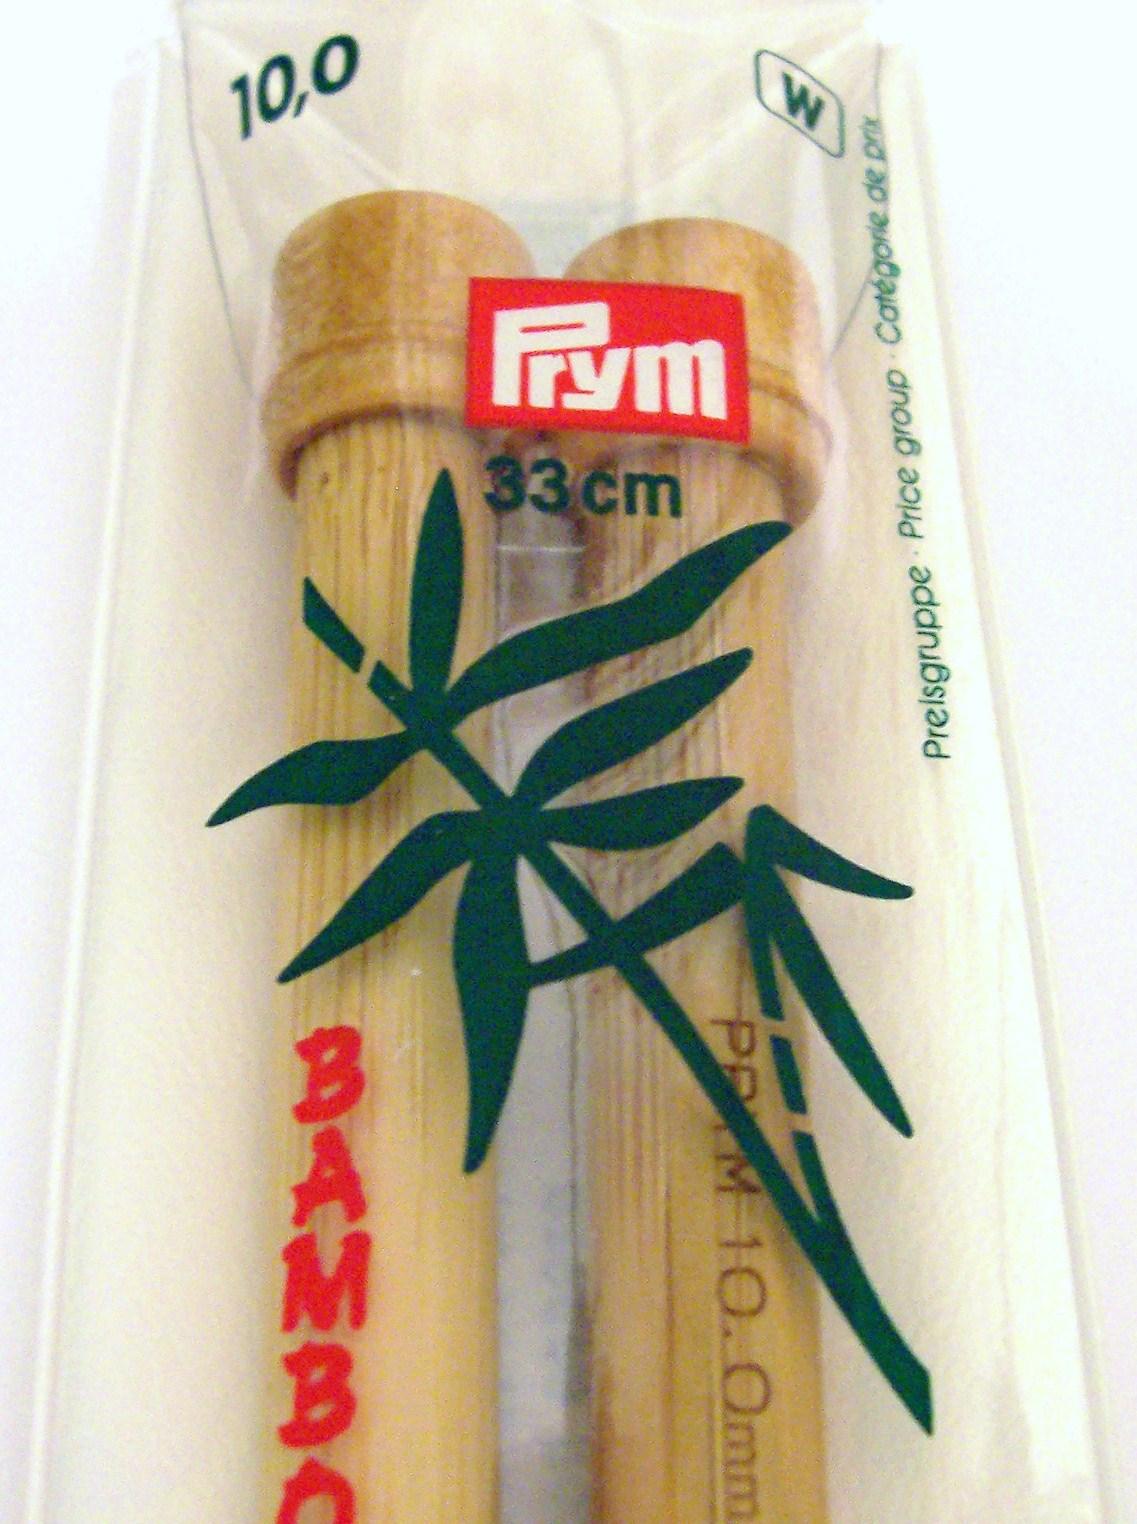 Prym 10mm, Length 33cm Bamboo Knitting Needles